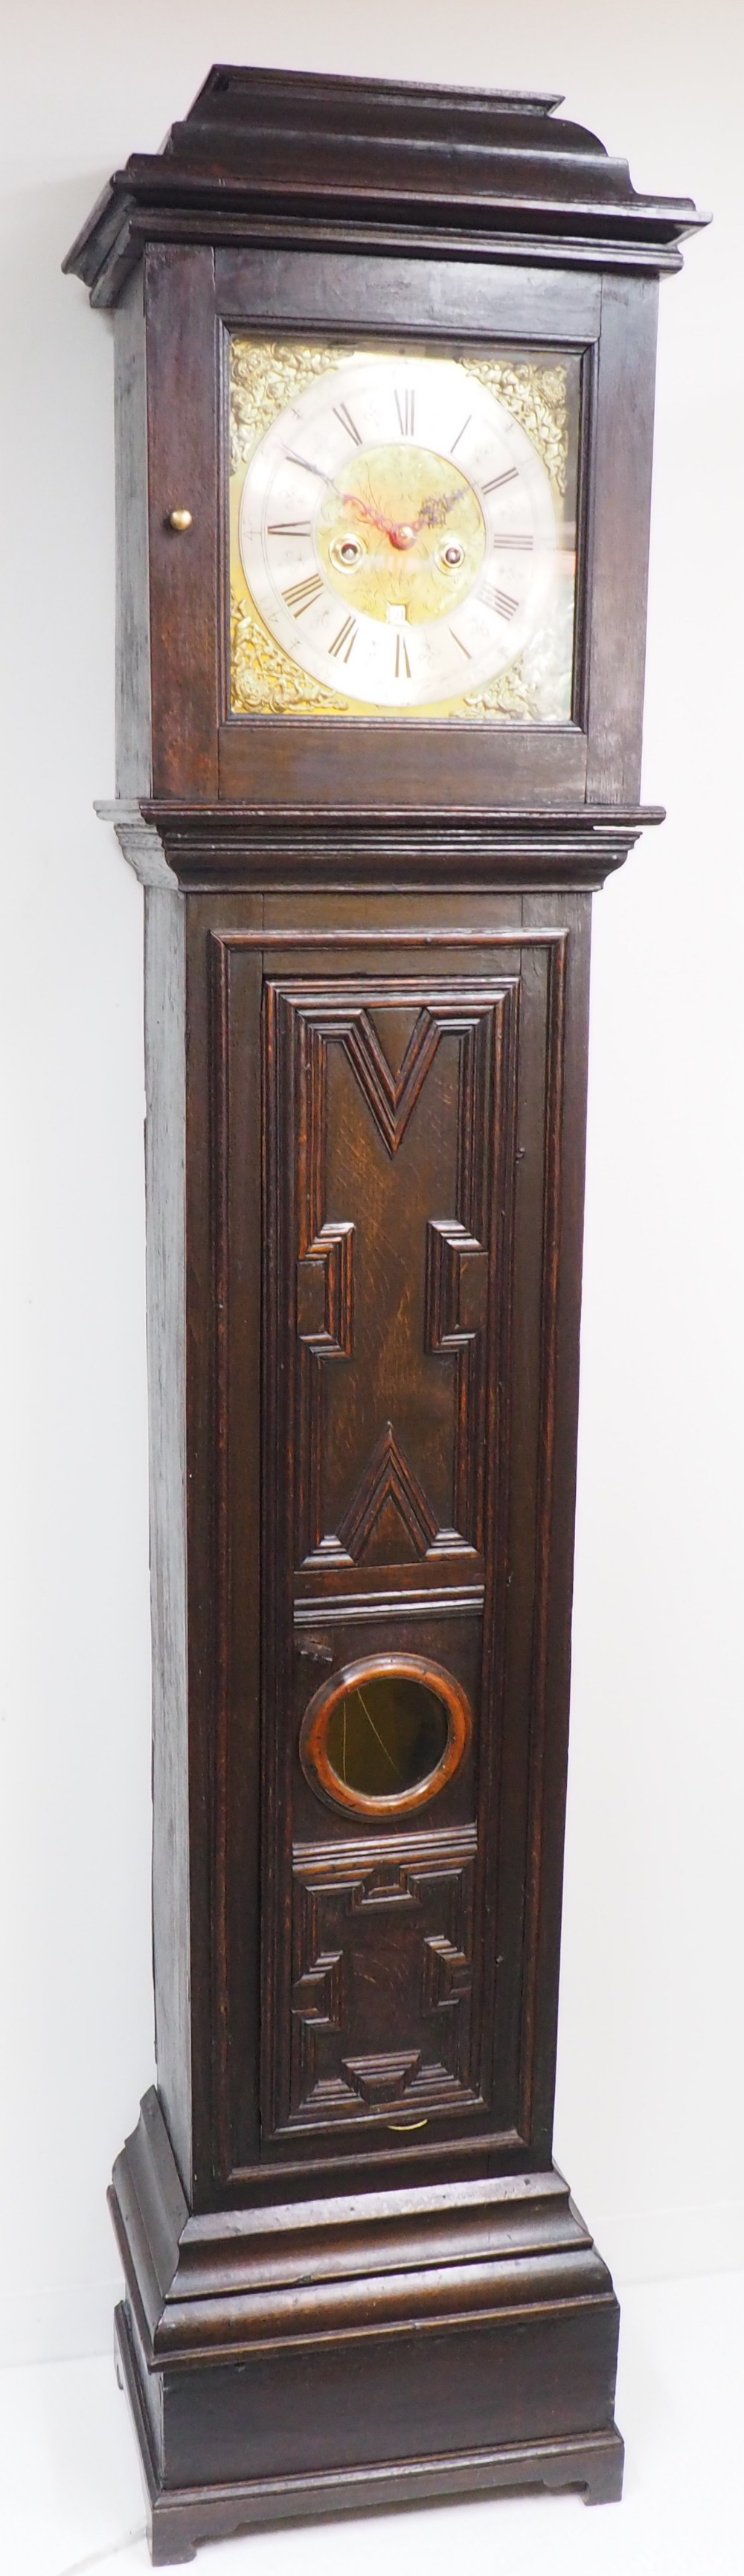 18thc english longcase clock in oak case silver brass dial signed john taylor